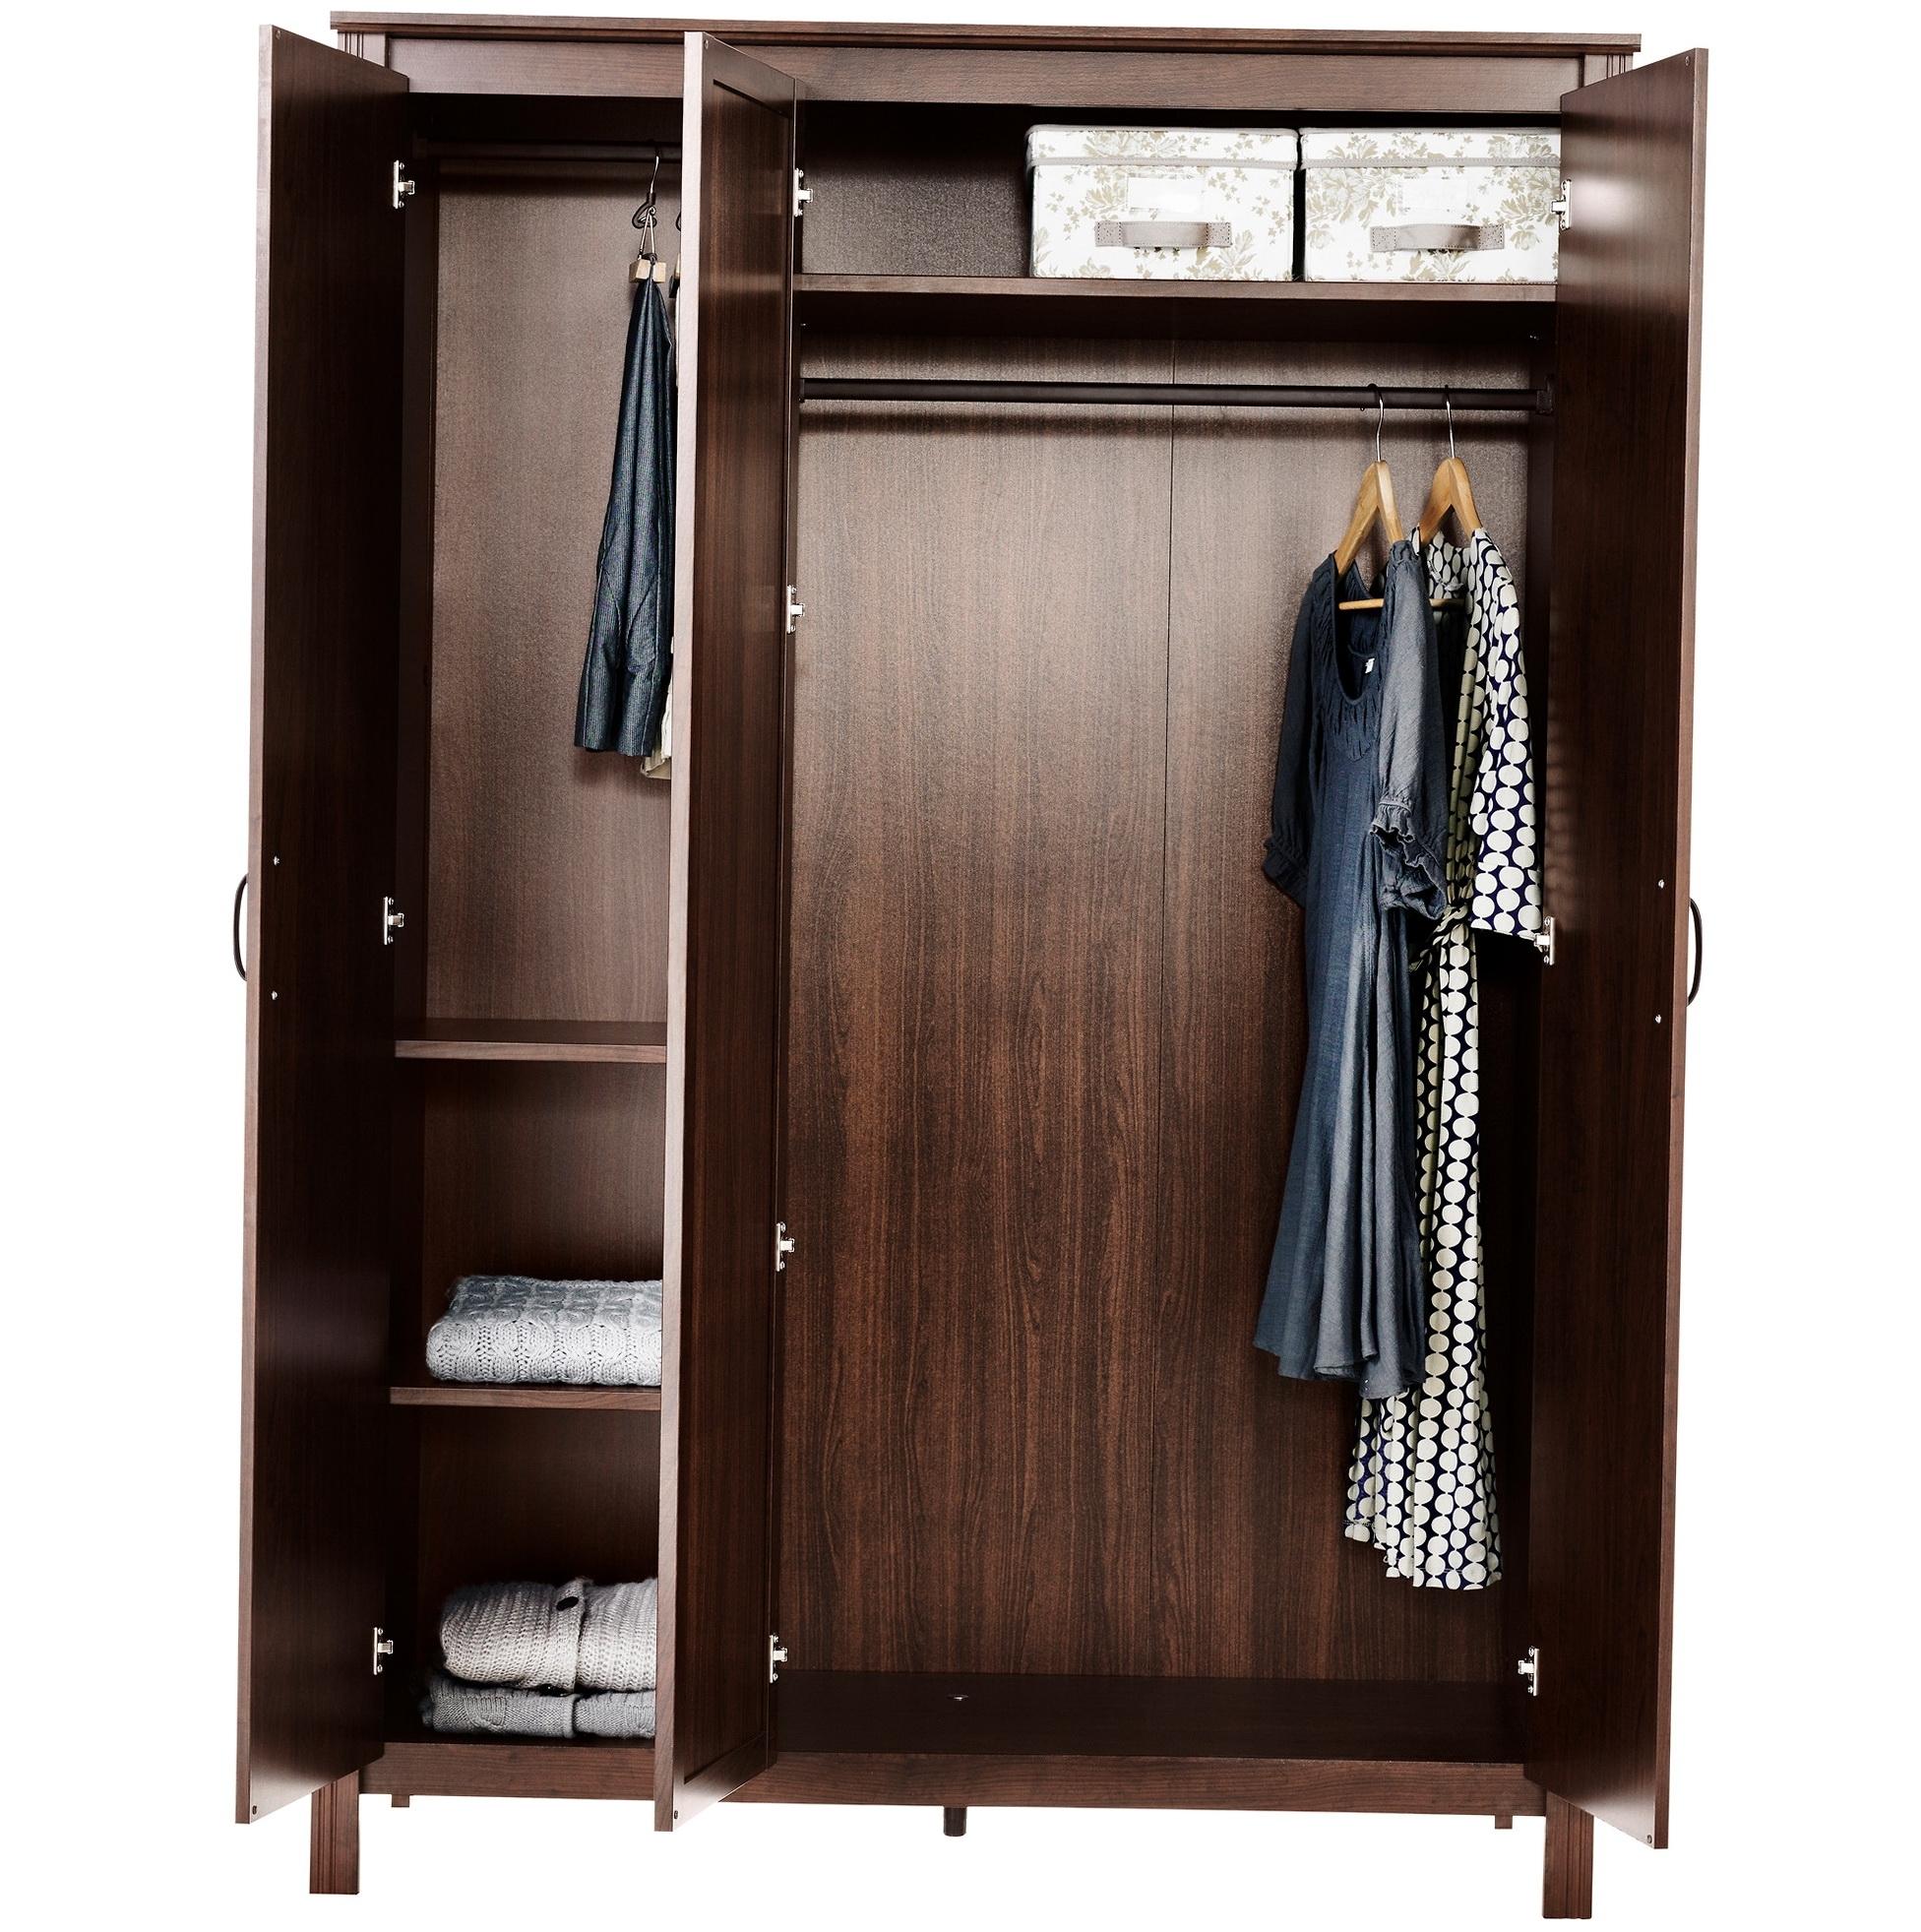 Modern Portable Closet Philippines | Roselawnlutheran Regarding Portable Wardrobe Closet (Image 10 of 27)